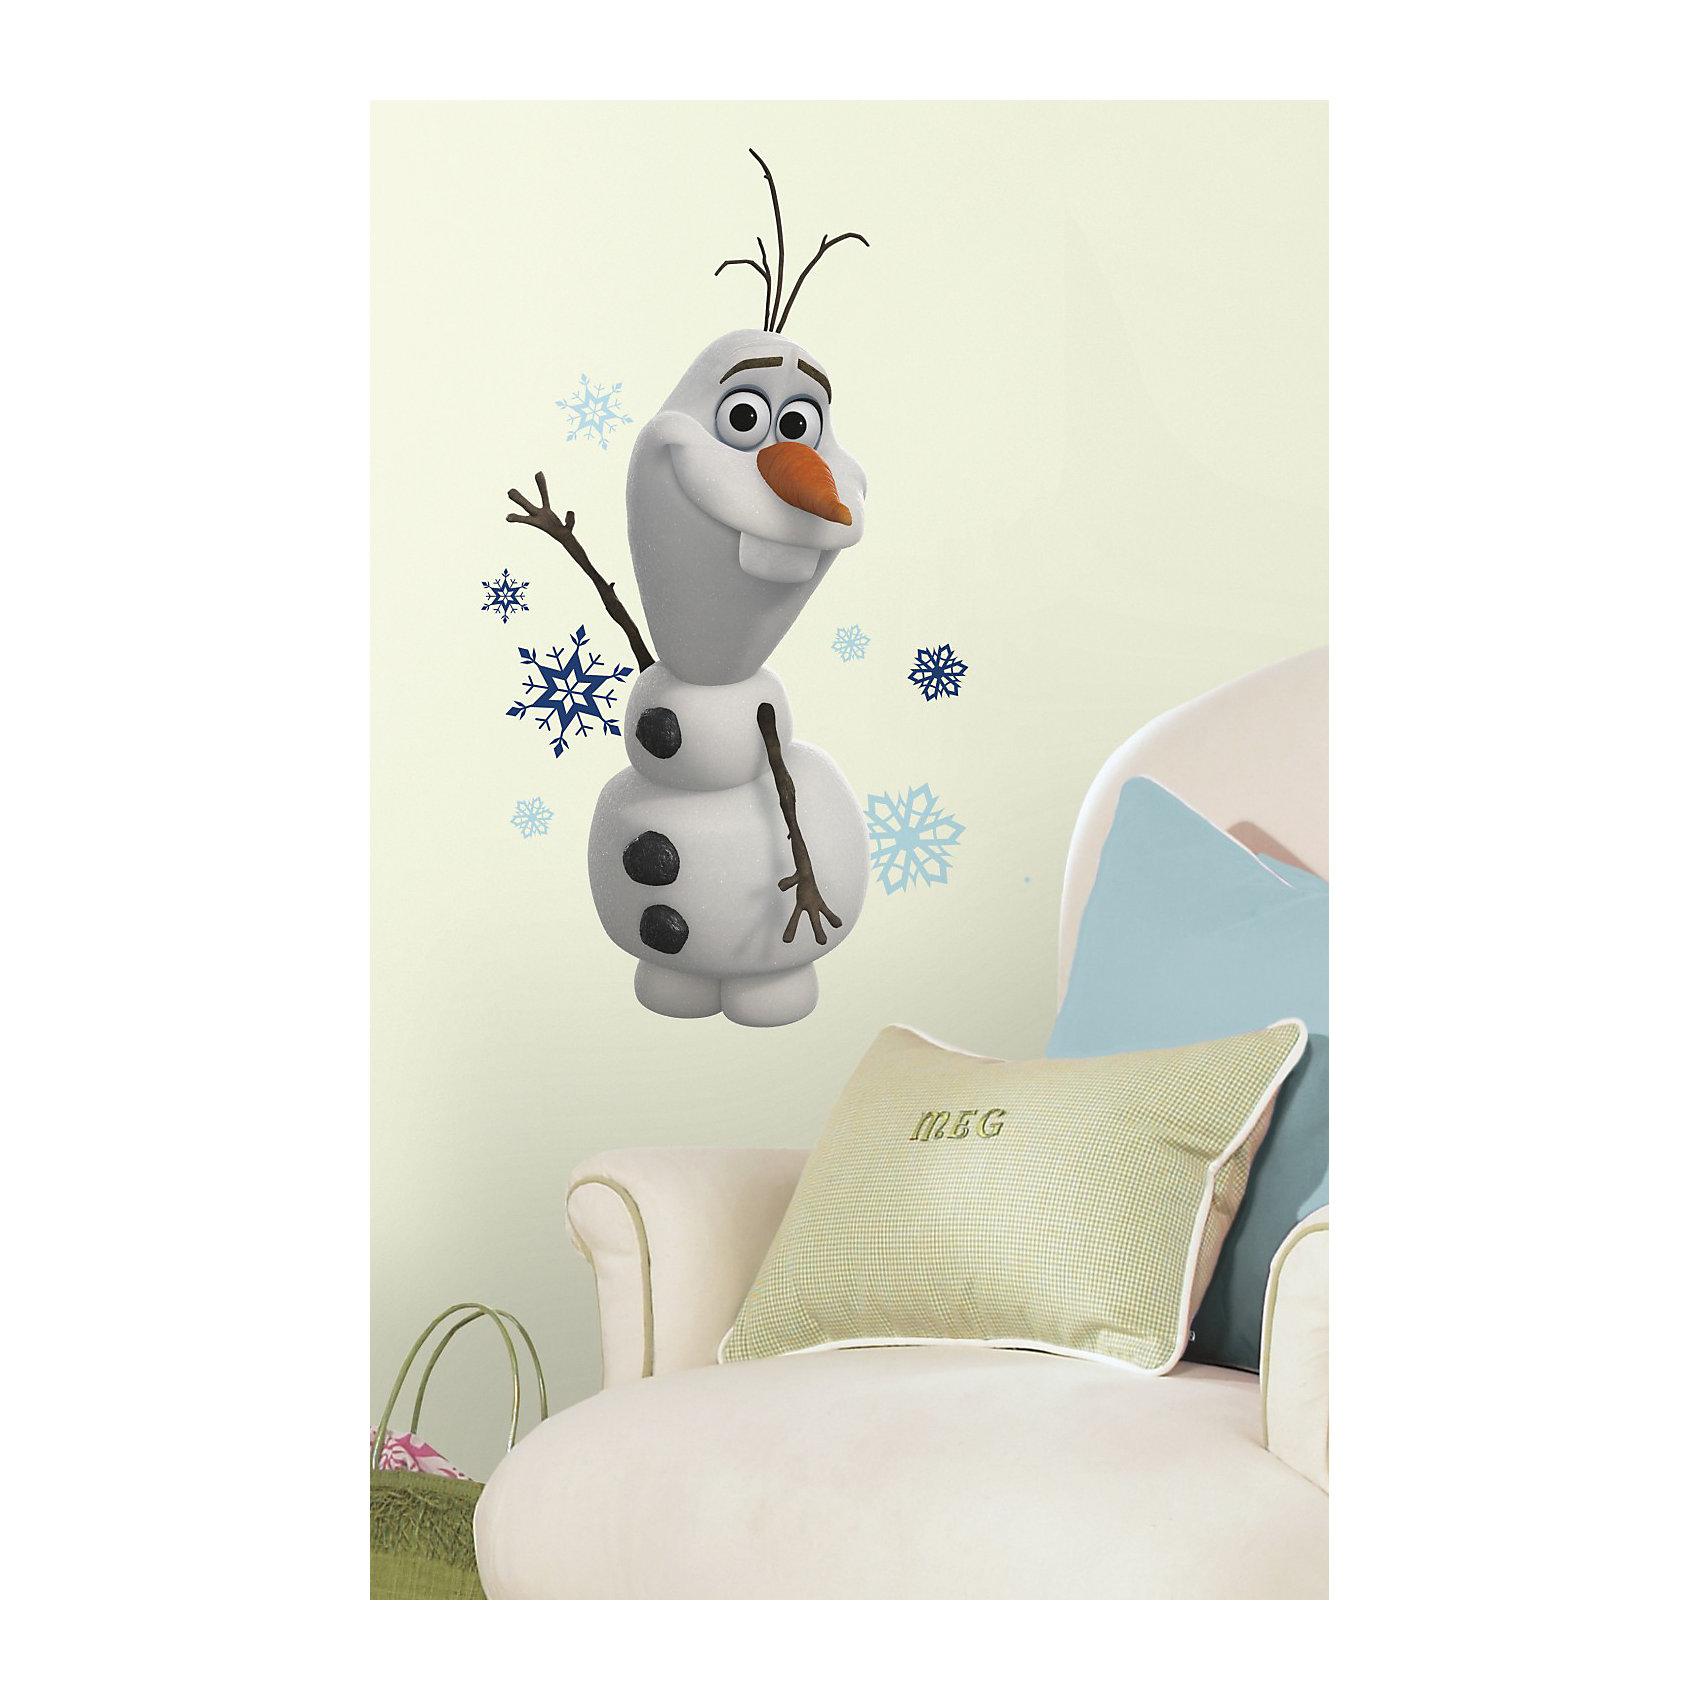 RoomMates Наклейки для декора Снеговик Олаф, Холодное сердце сердце вдребезги или месть холодное блюдо